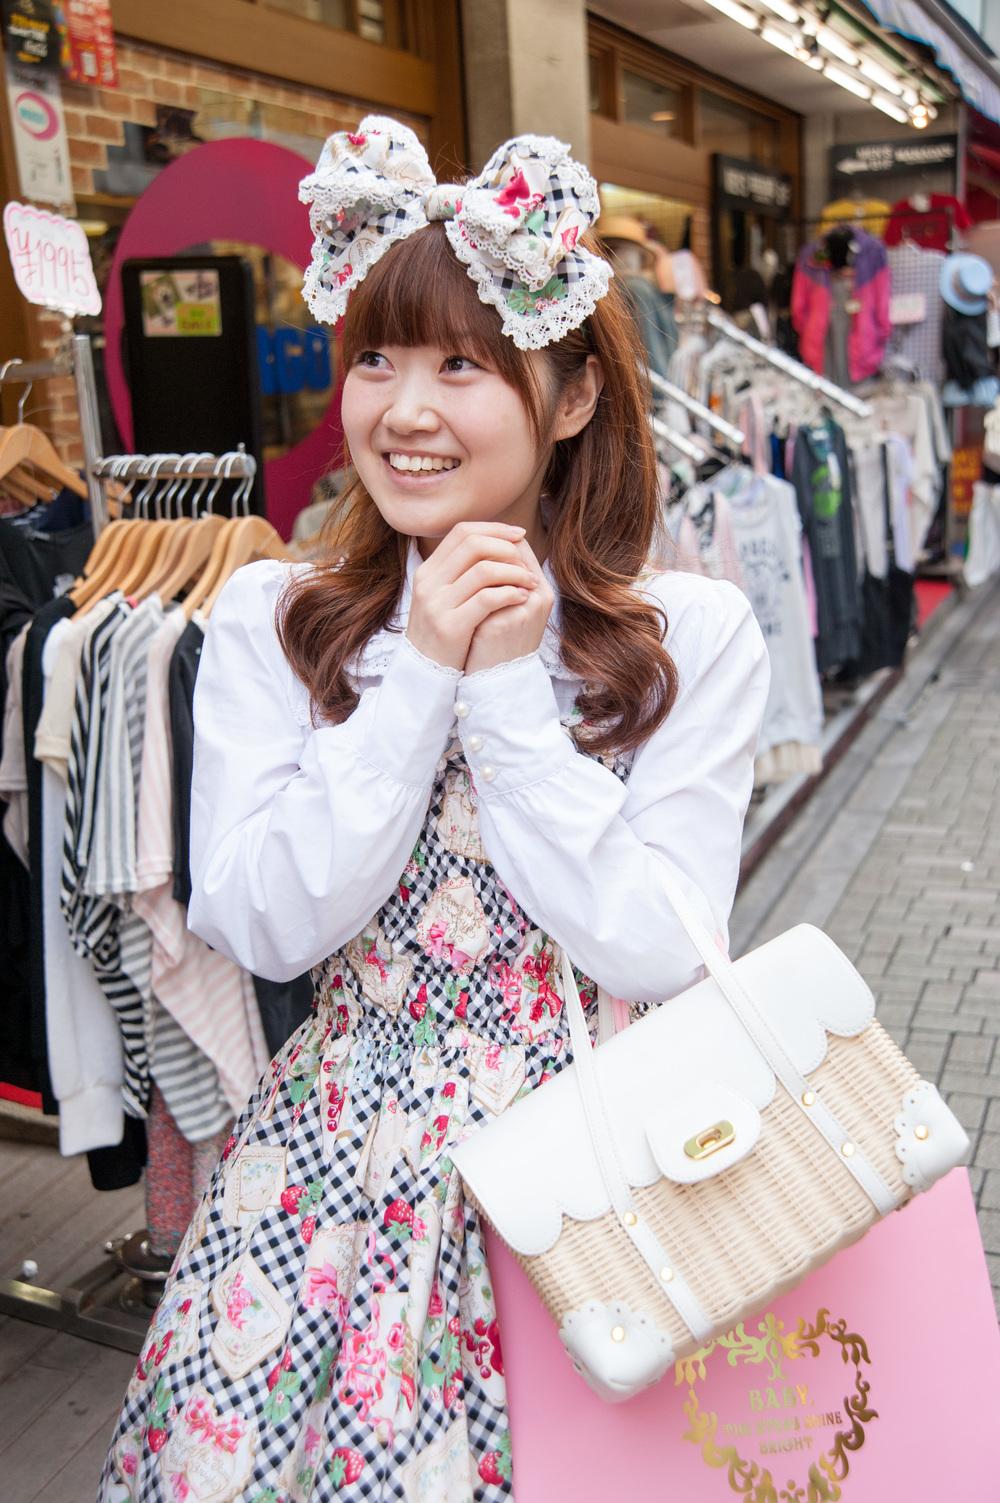 Cosplay teenager, Harajuku district, Tokyo